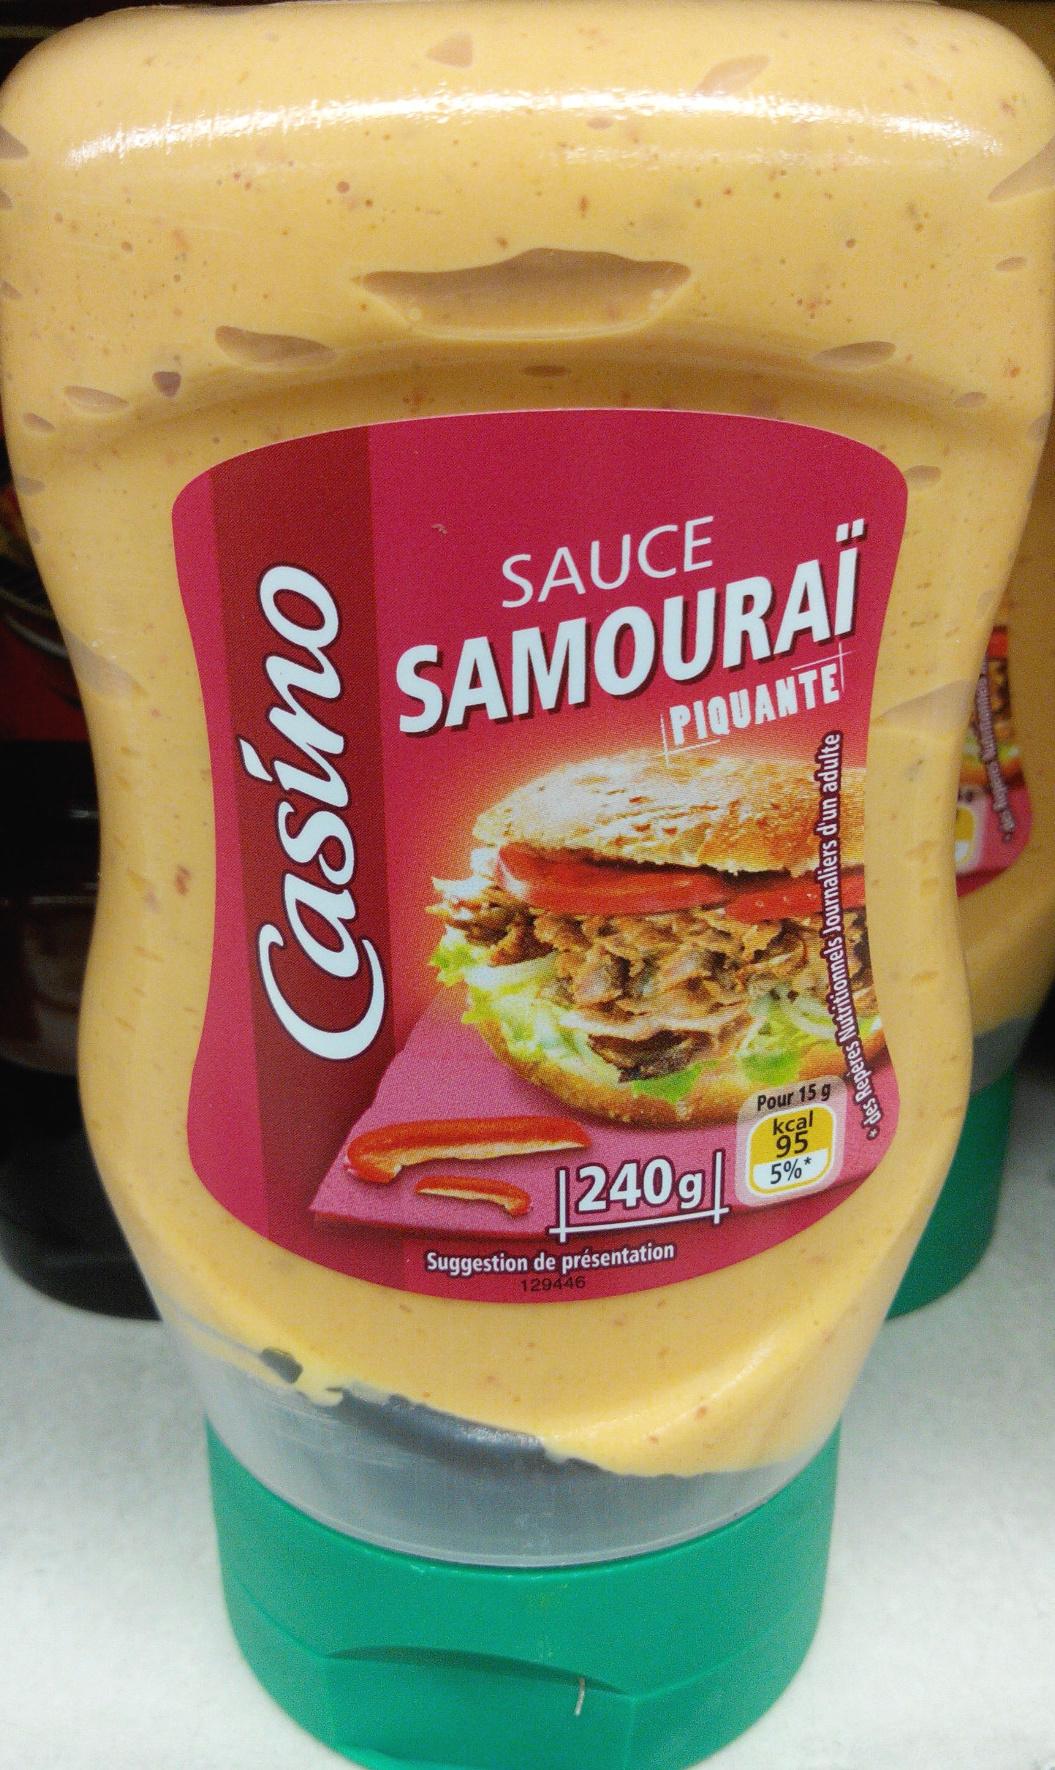 Sauce samouraï piquante - Product - fr